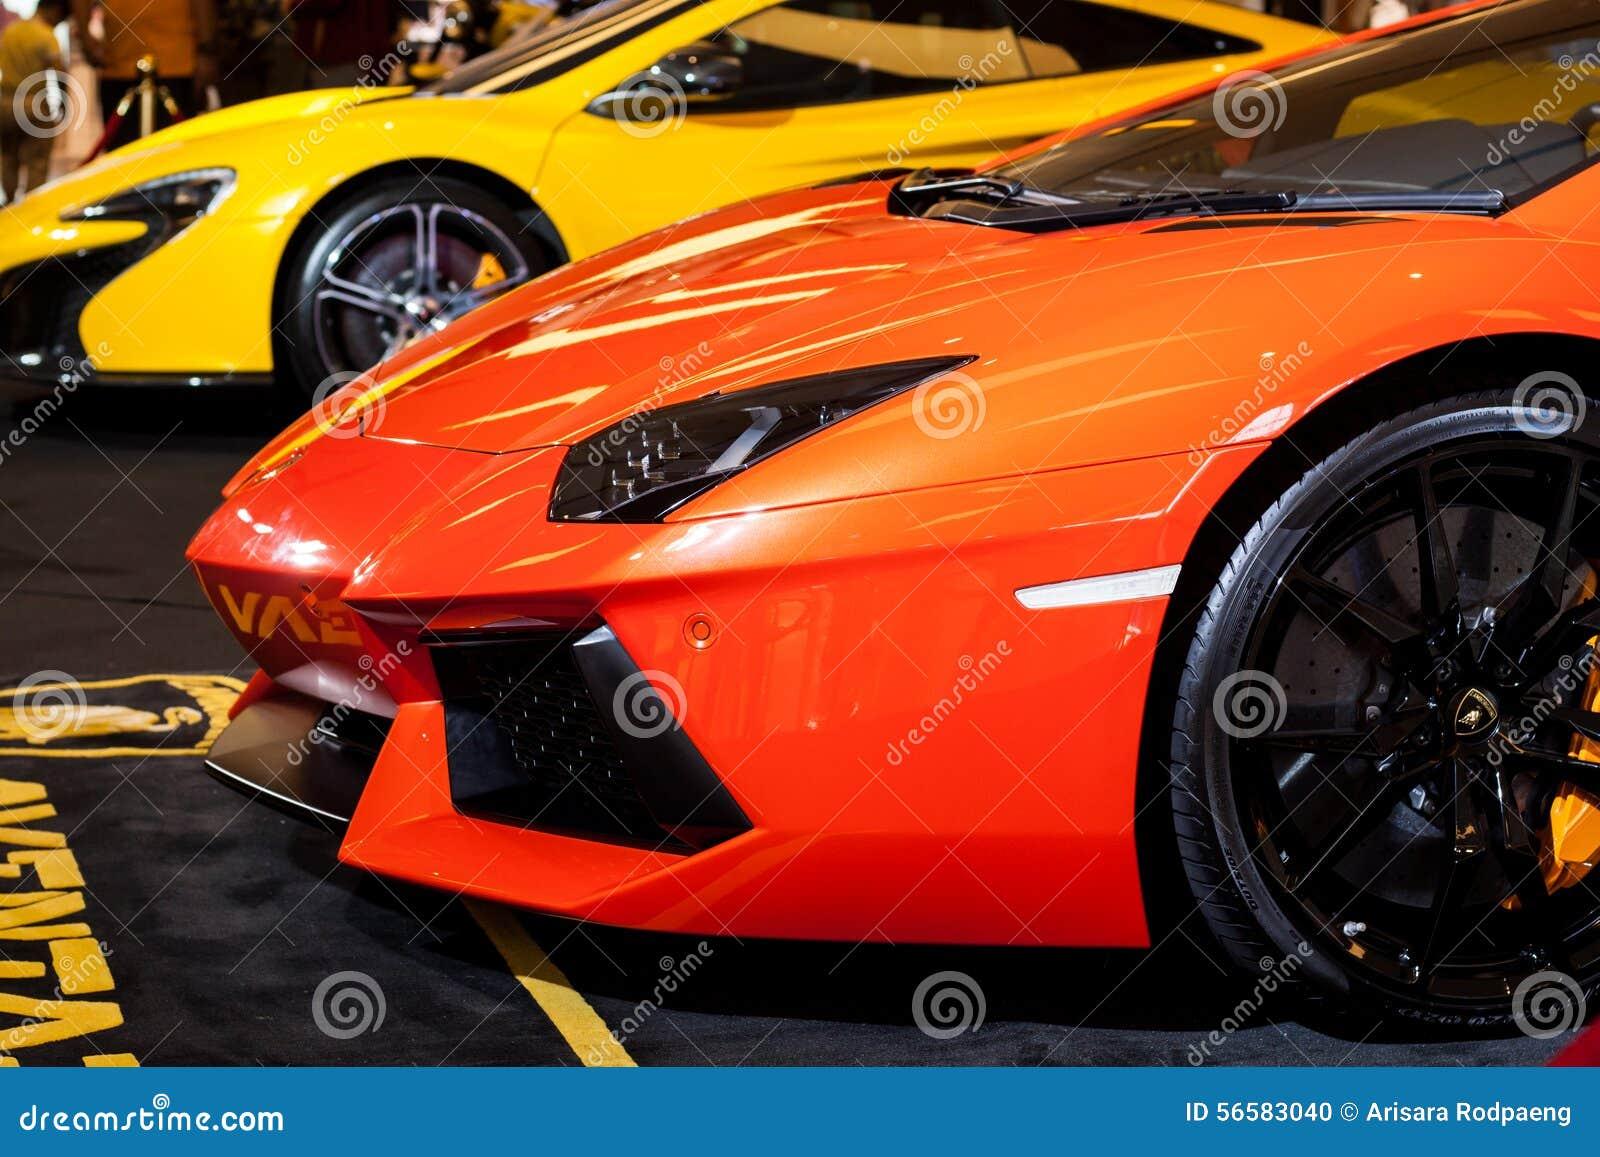 БАНГКОК, ТАИЛАНД - 7-ОЕ АВГУСТА: Новое Lamborghini показано на парагоне Сиама на 7,2015 -го августа в Бангкоке, Таиланде